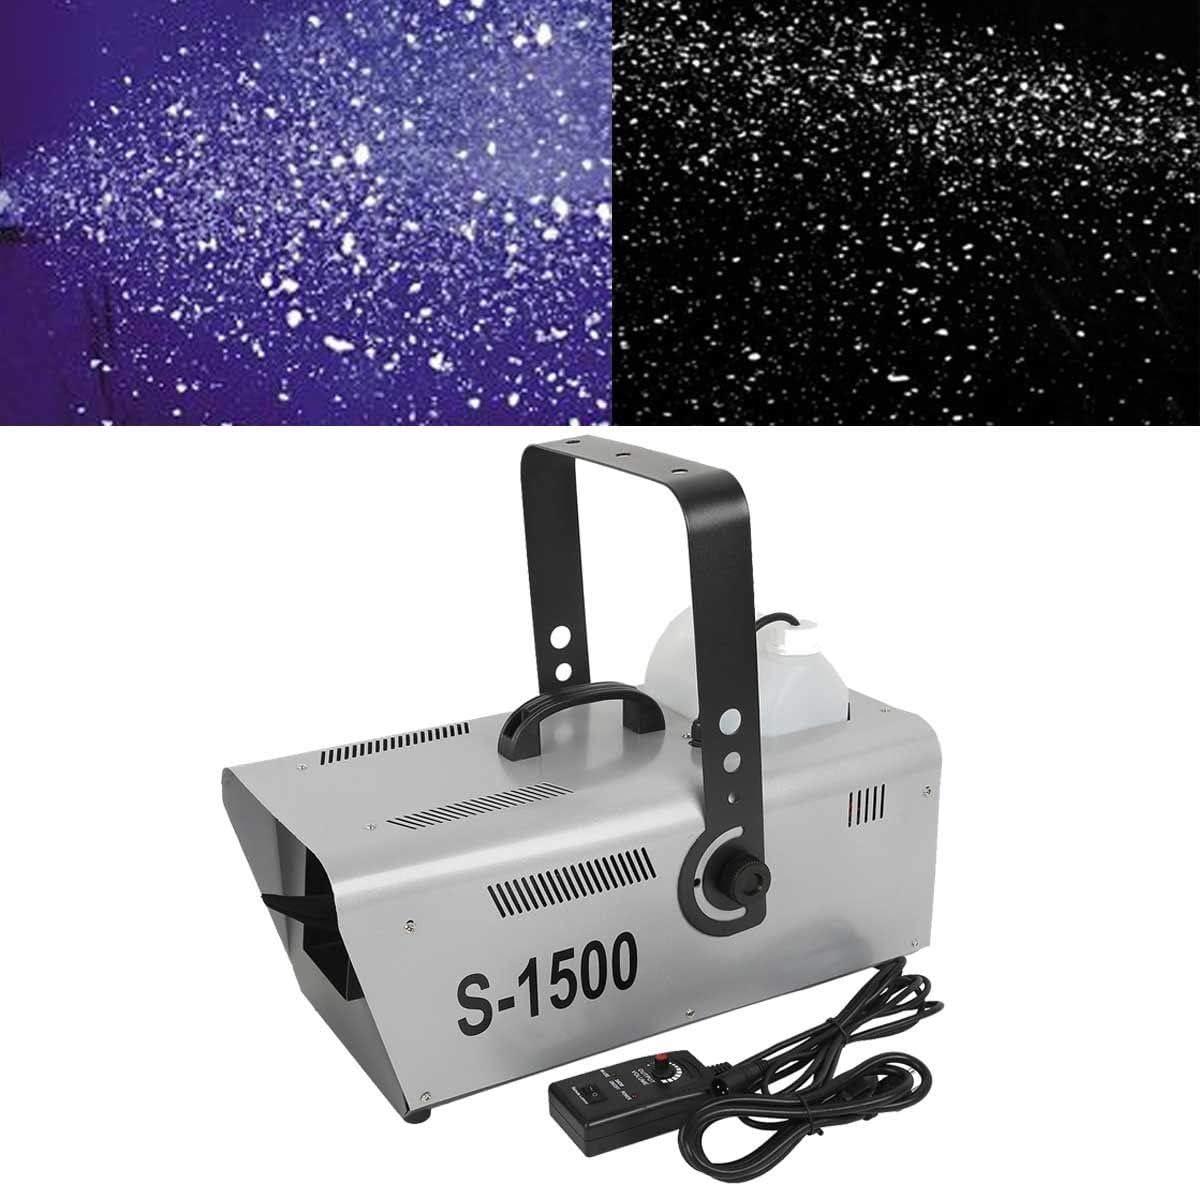 Tengchang 1500W Snow Machine Professional Stage DJ Party Snowflake Maker W/Controller